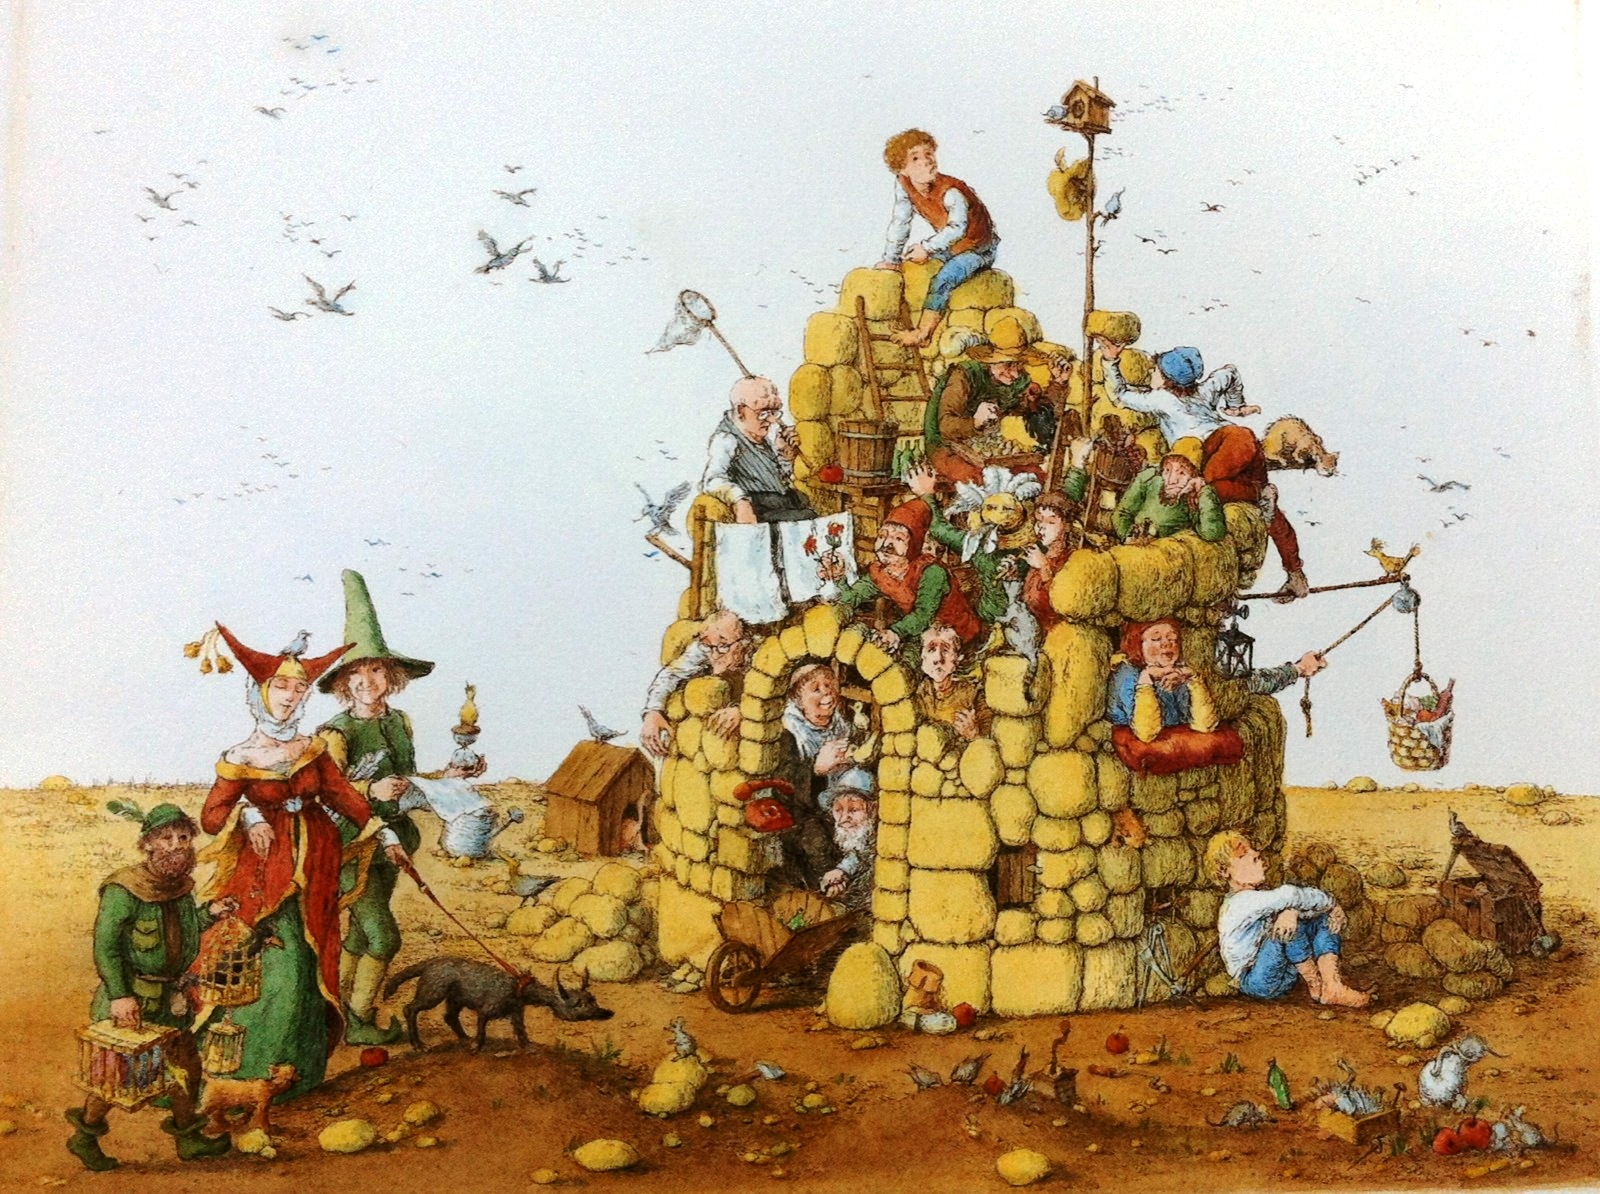 Artner, Margit: Der Palast